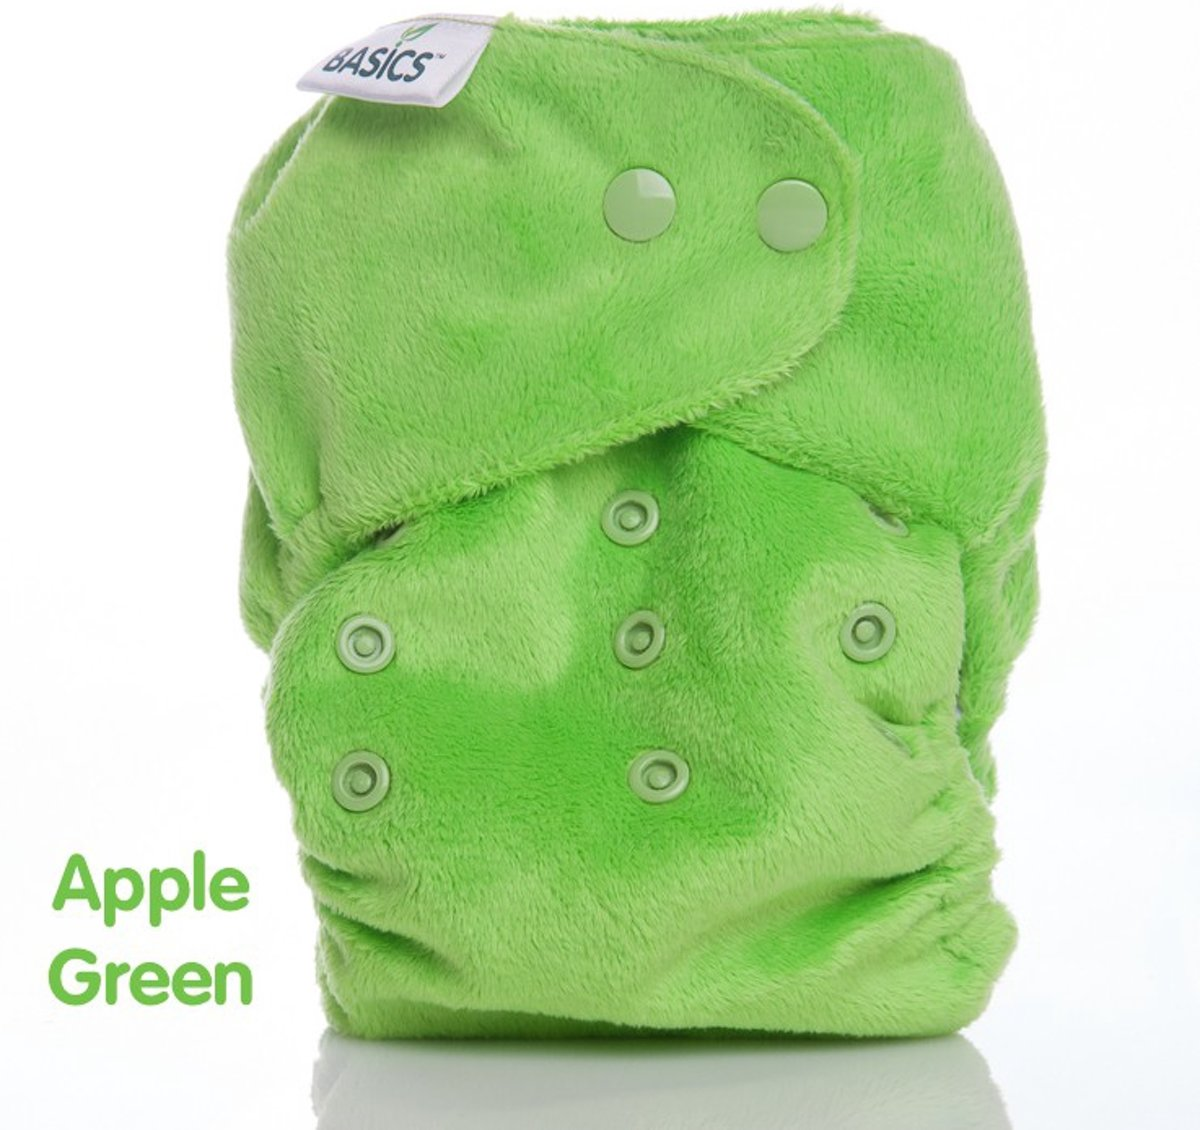 Basics Wasbare Luier All In Two Groen (1st)